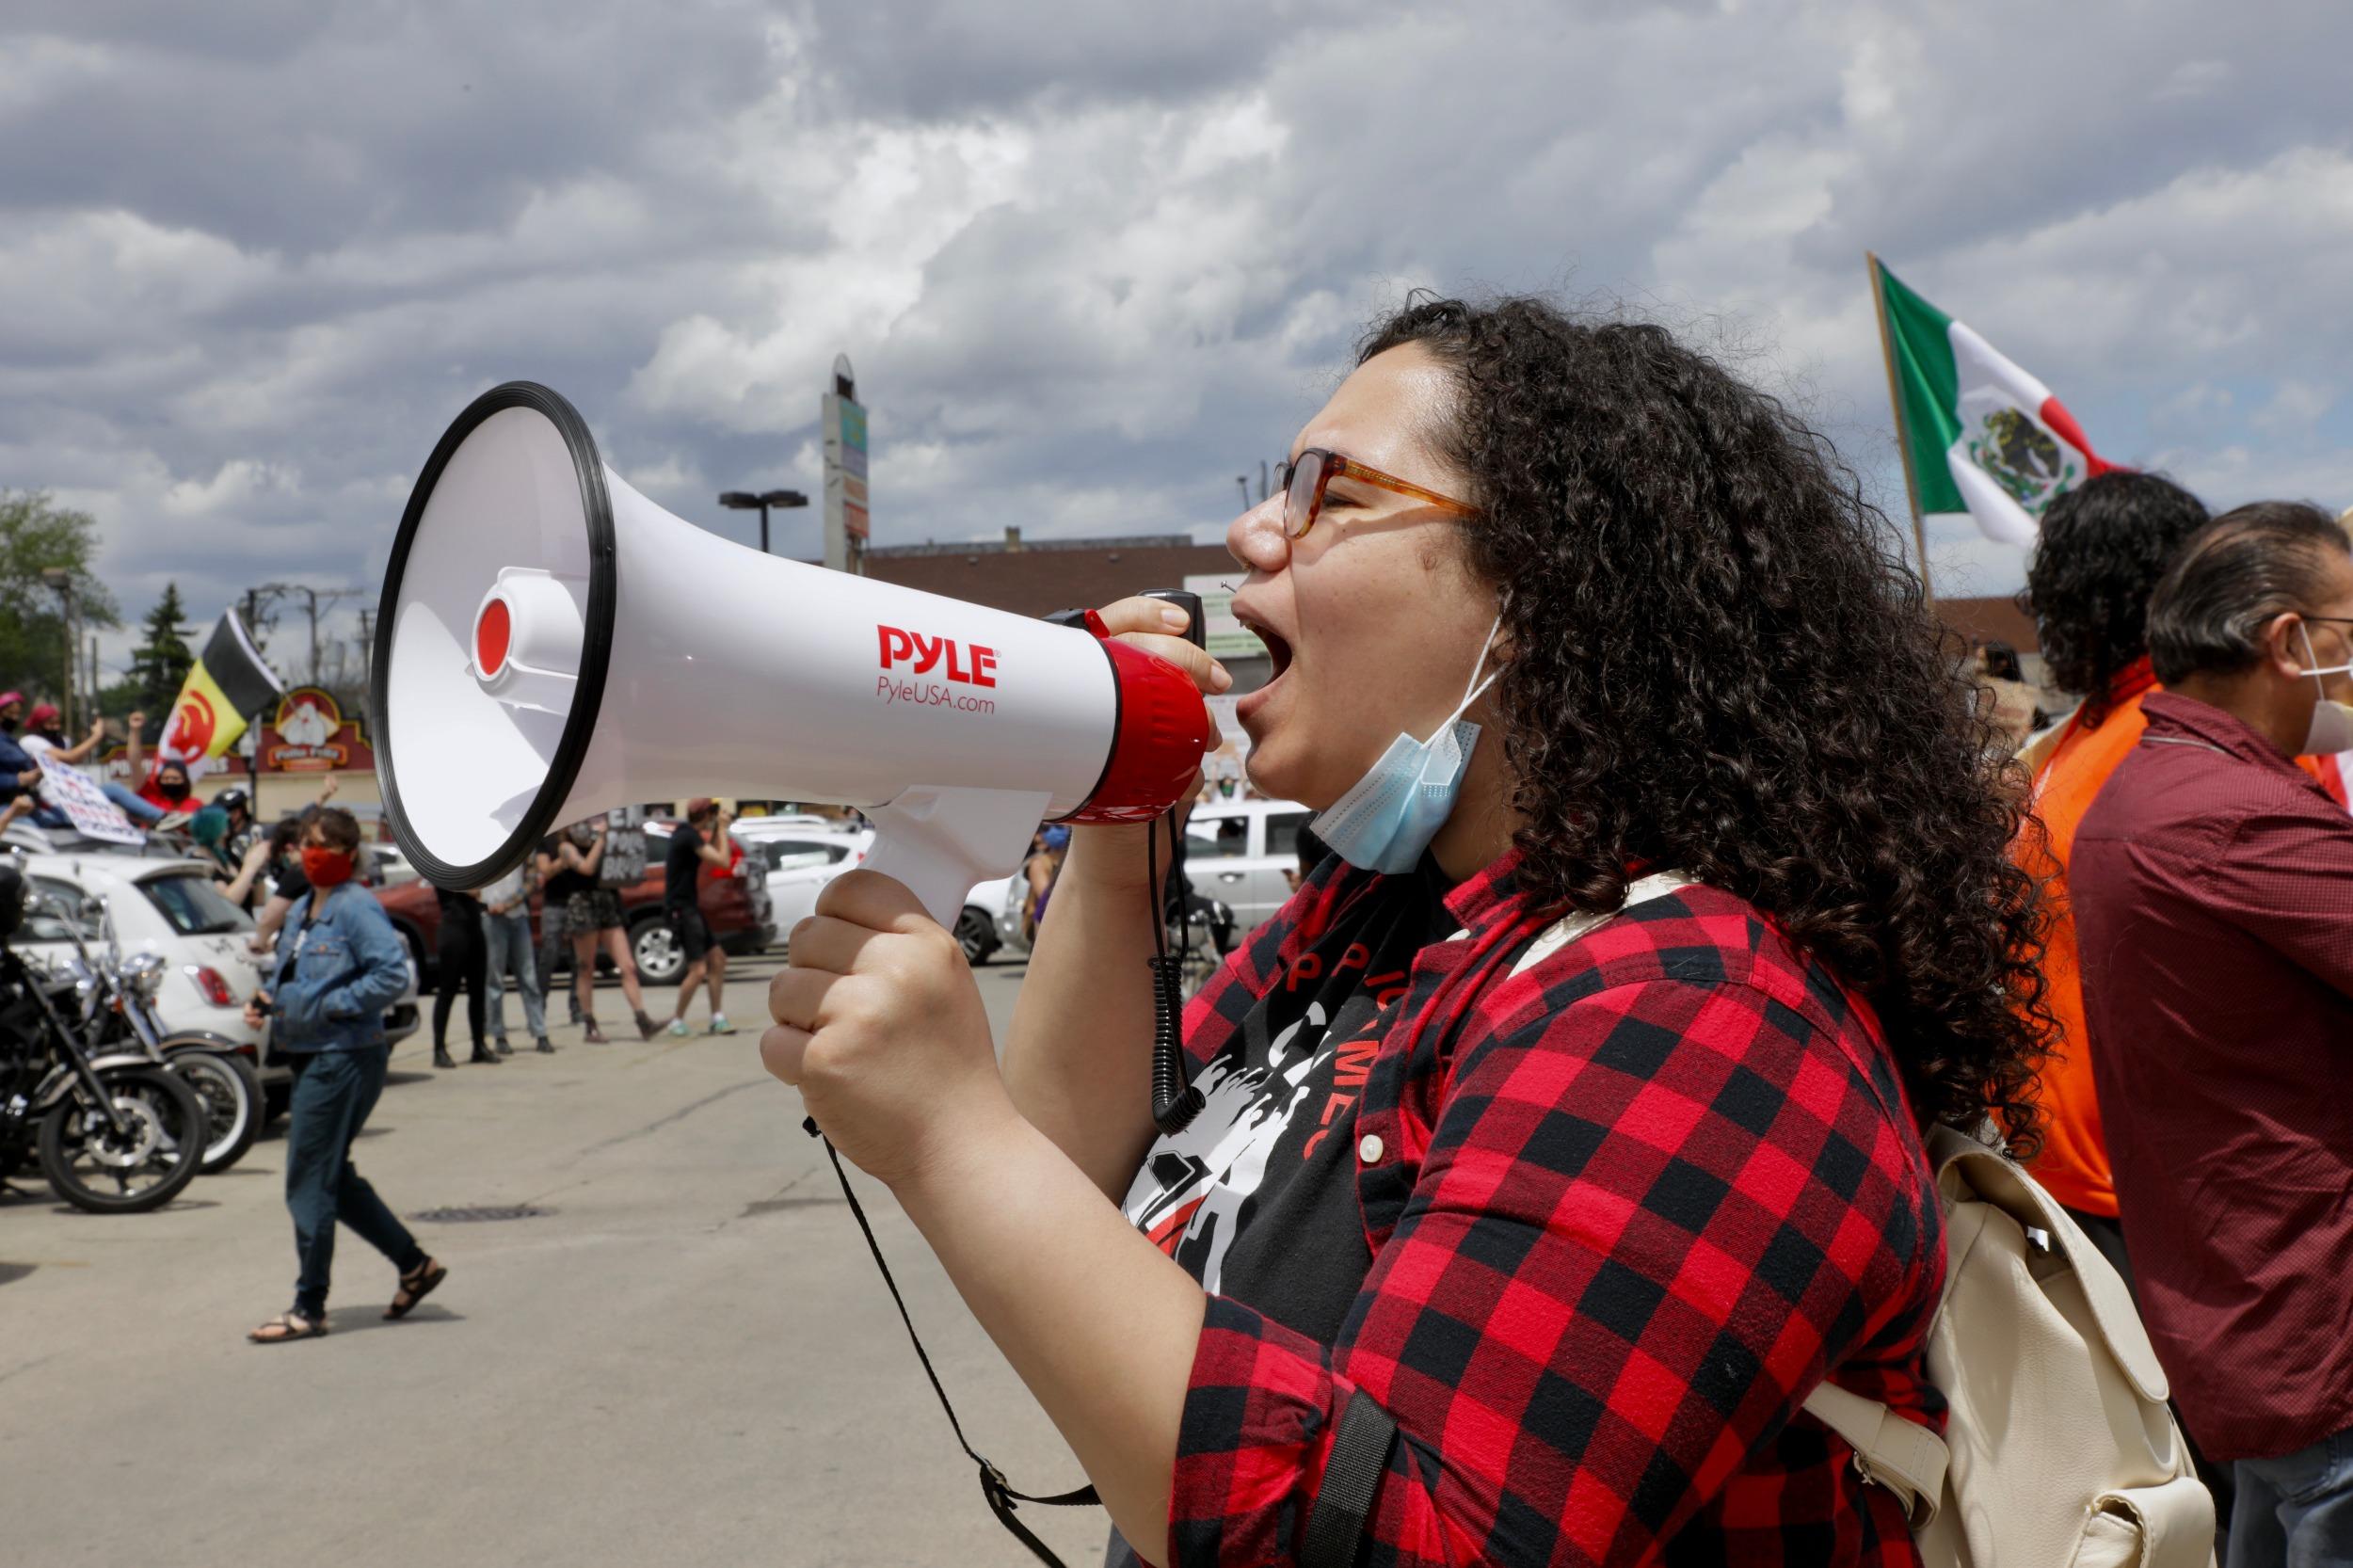 Organizer megaphone Floyd protest